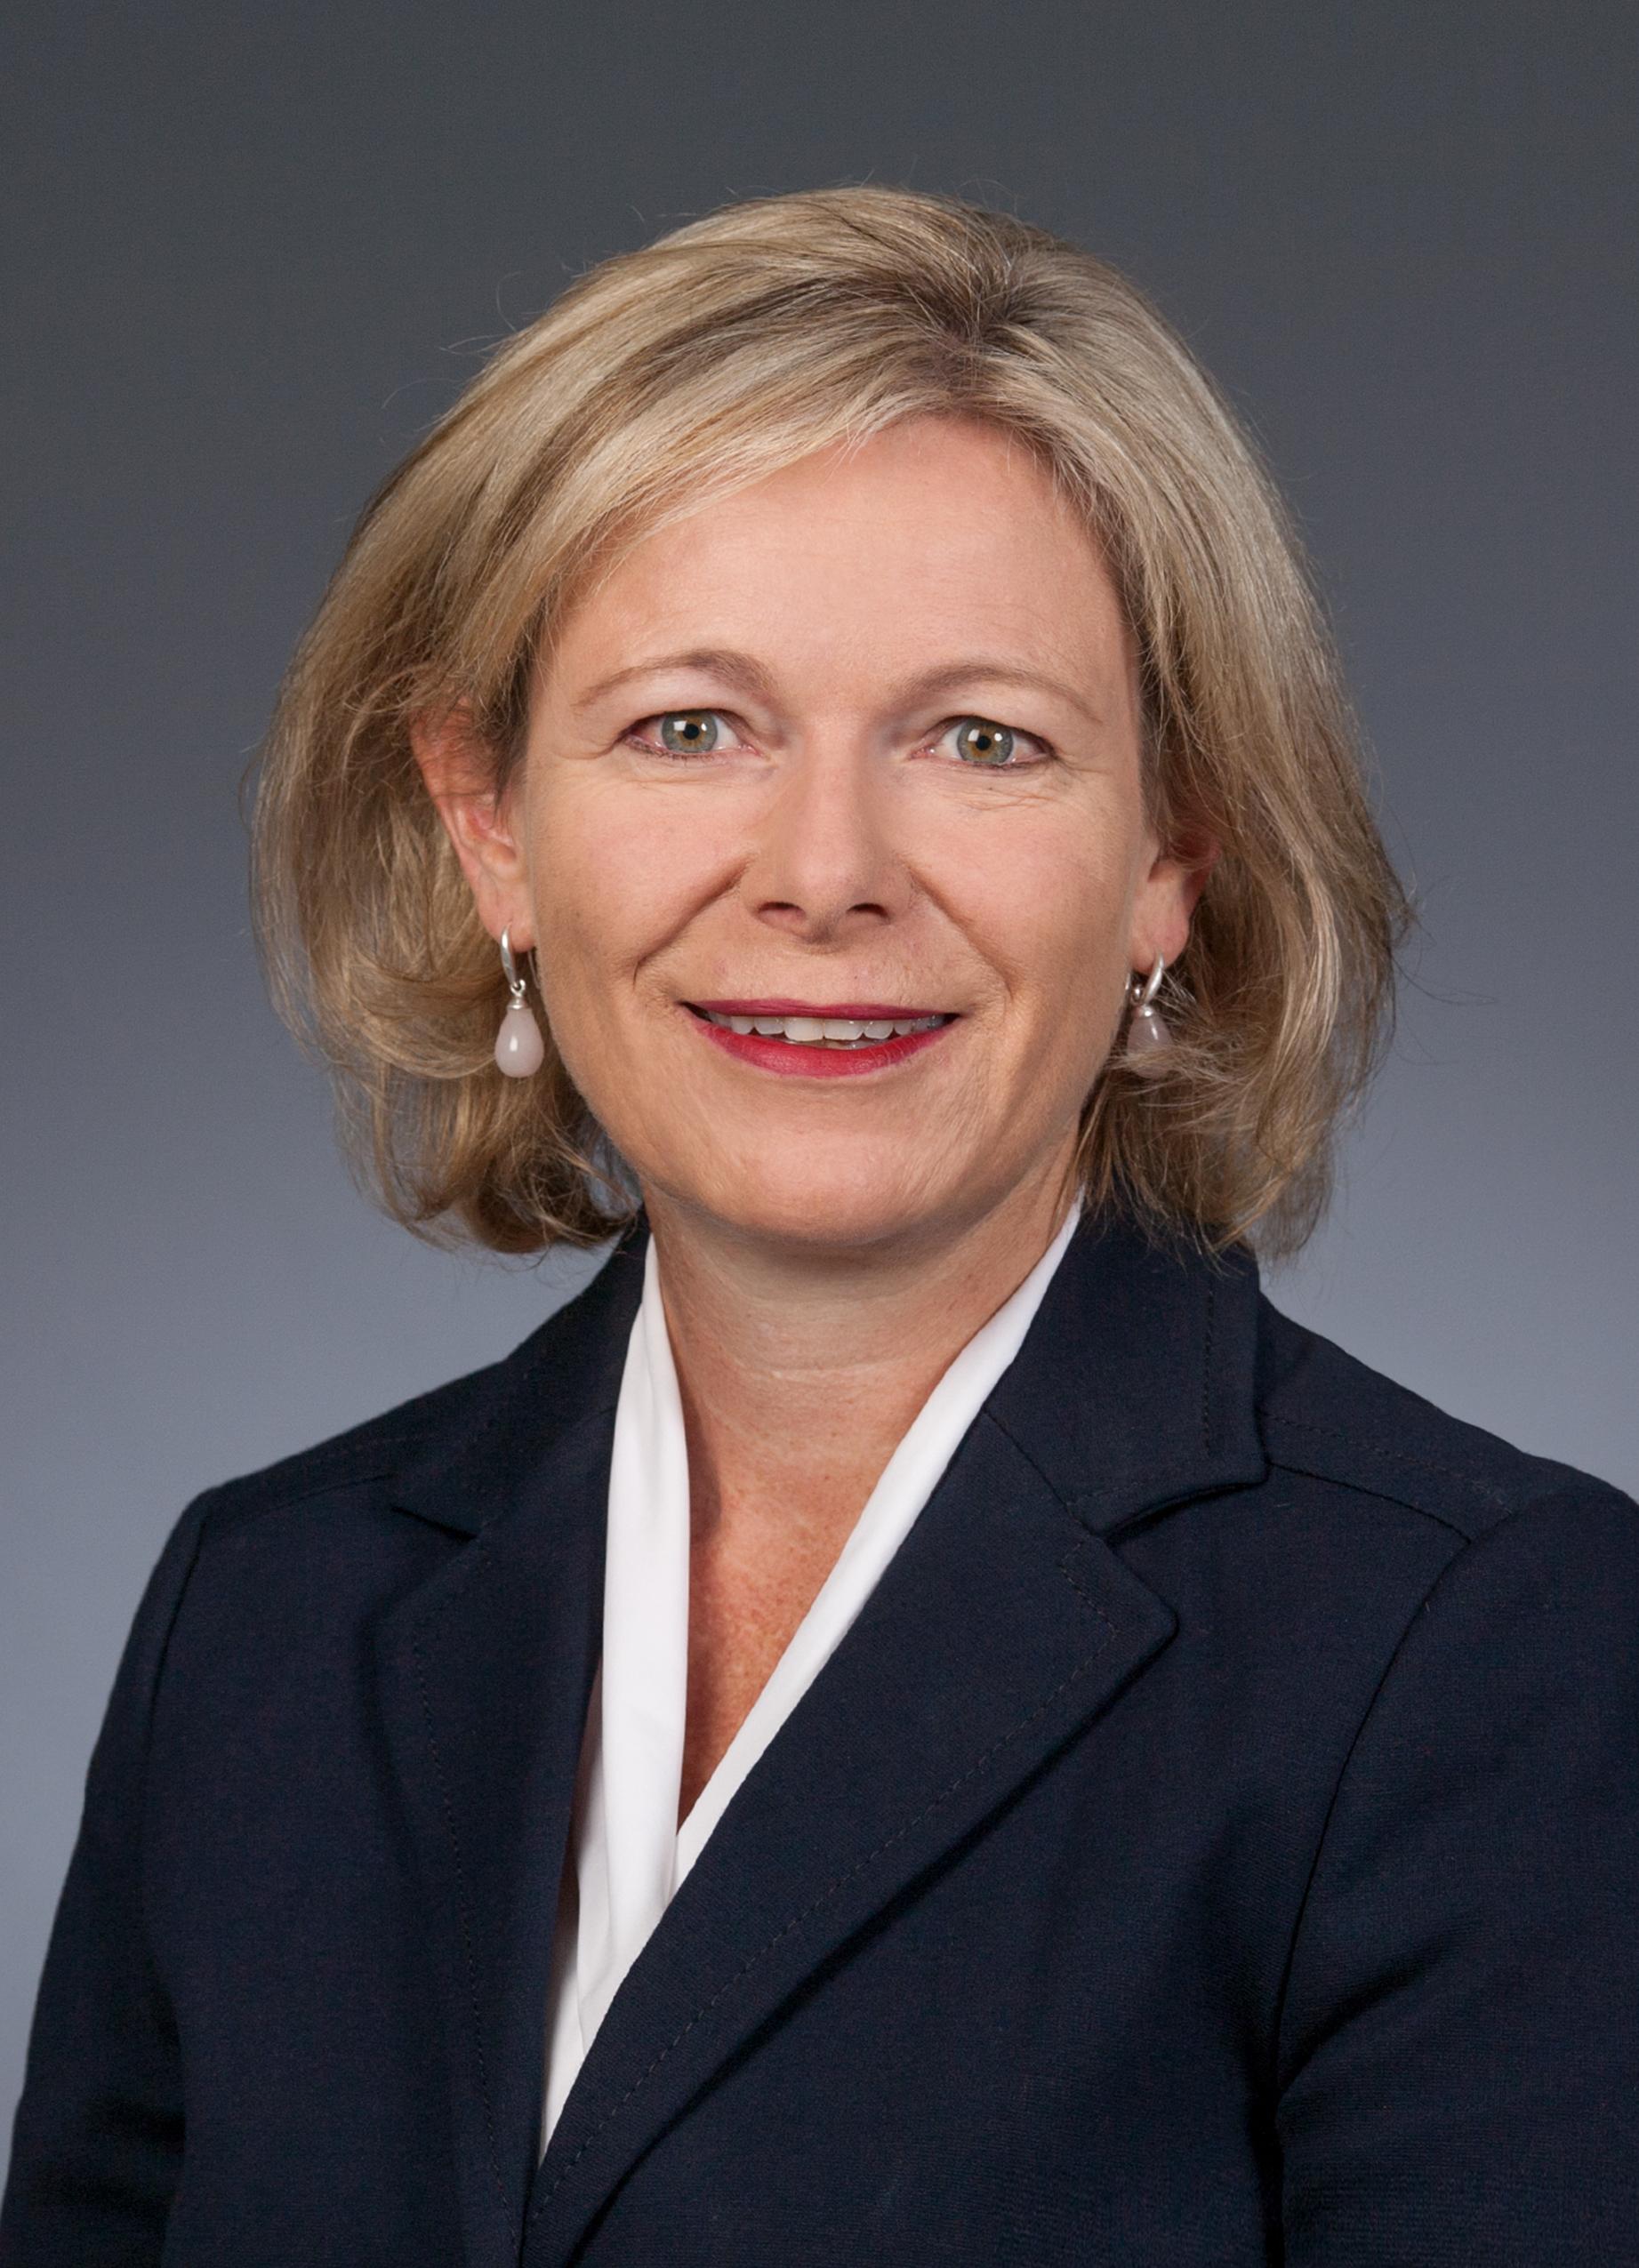 Bernadette Koch und Ronny Kaufmann komplettieren den Verwaltungsrat der Post